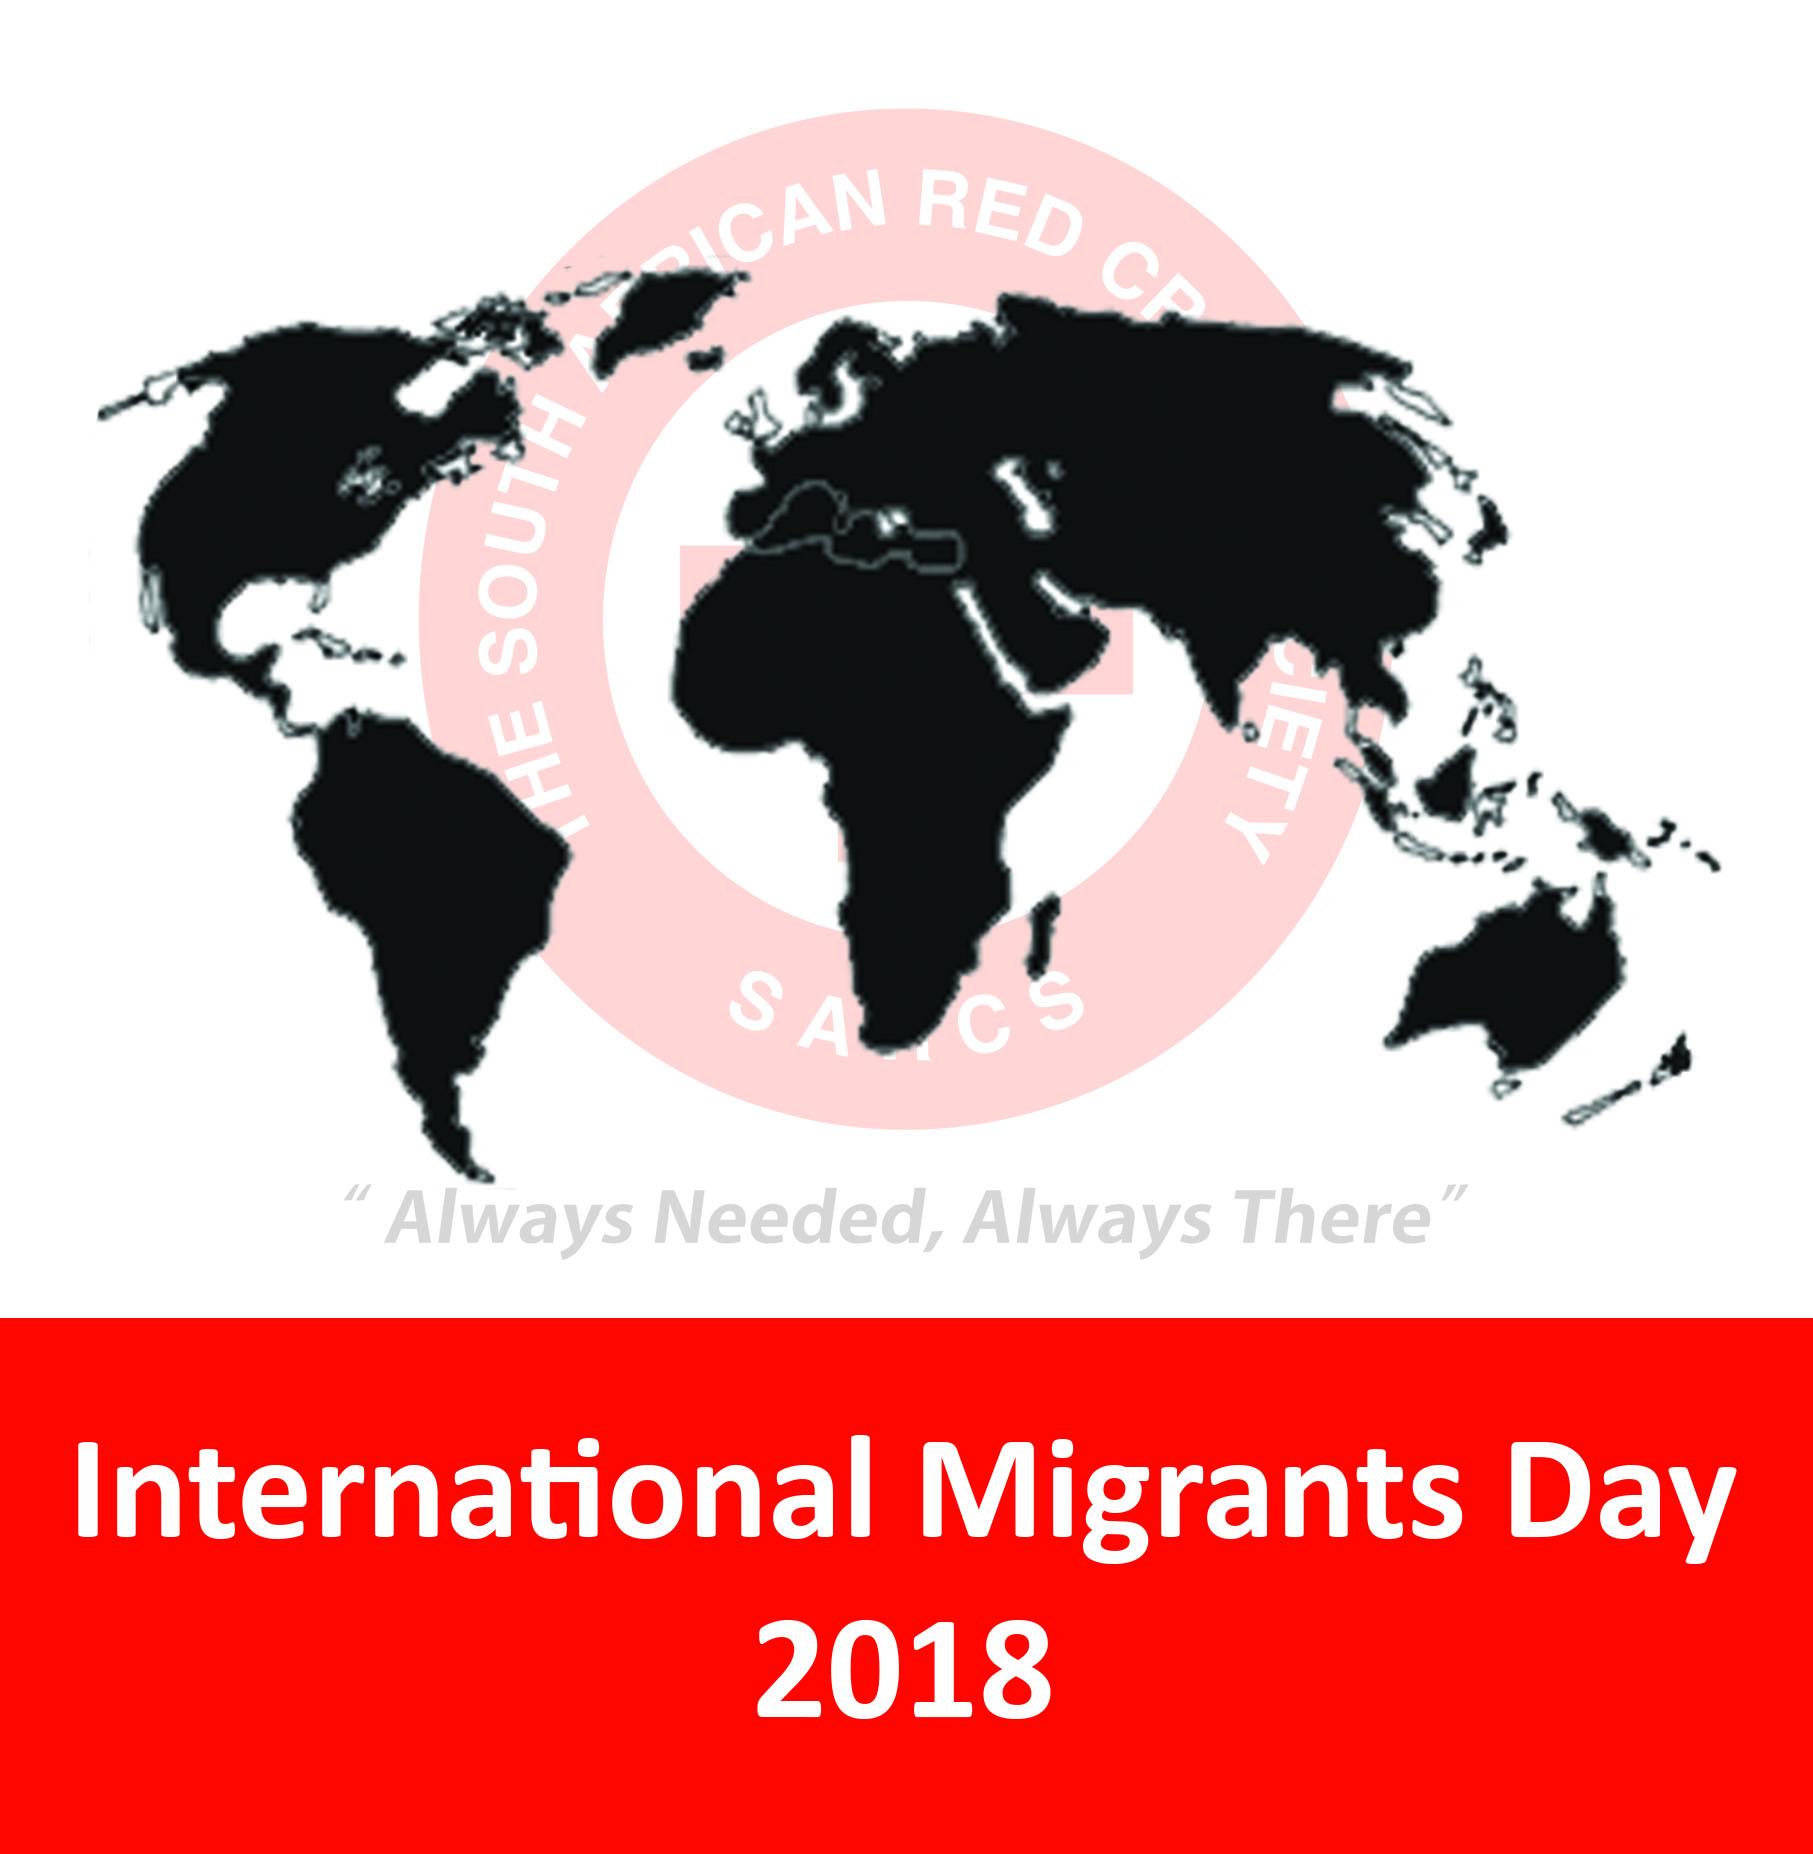 International Migrants Day – 18 December